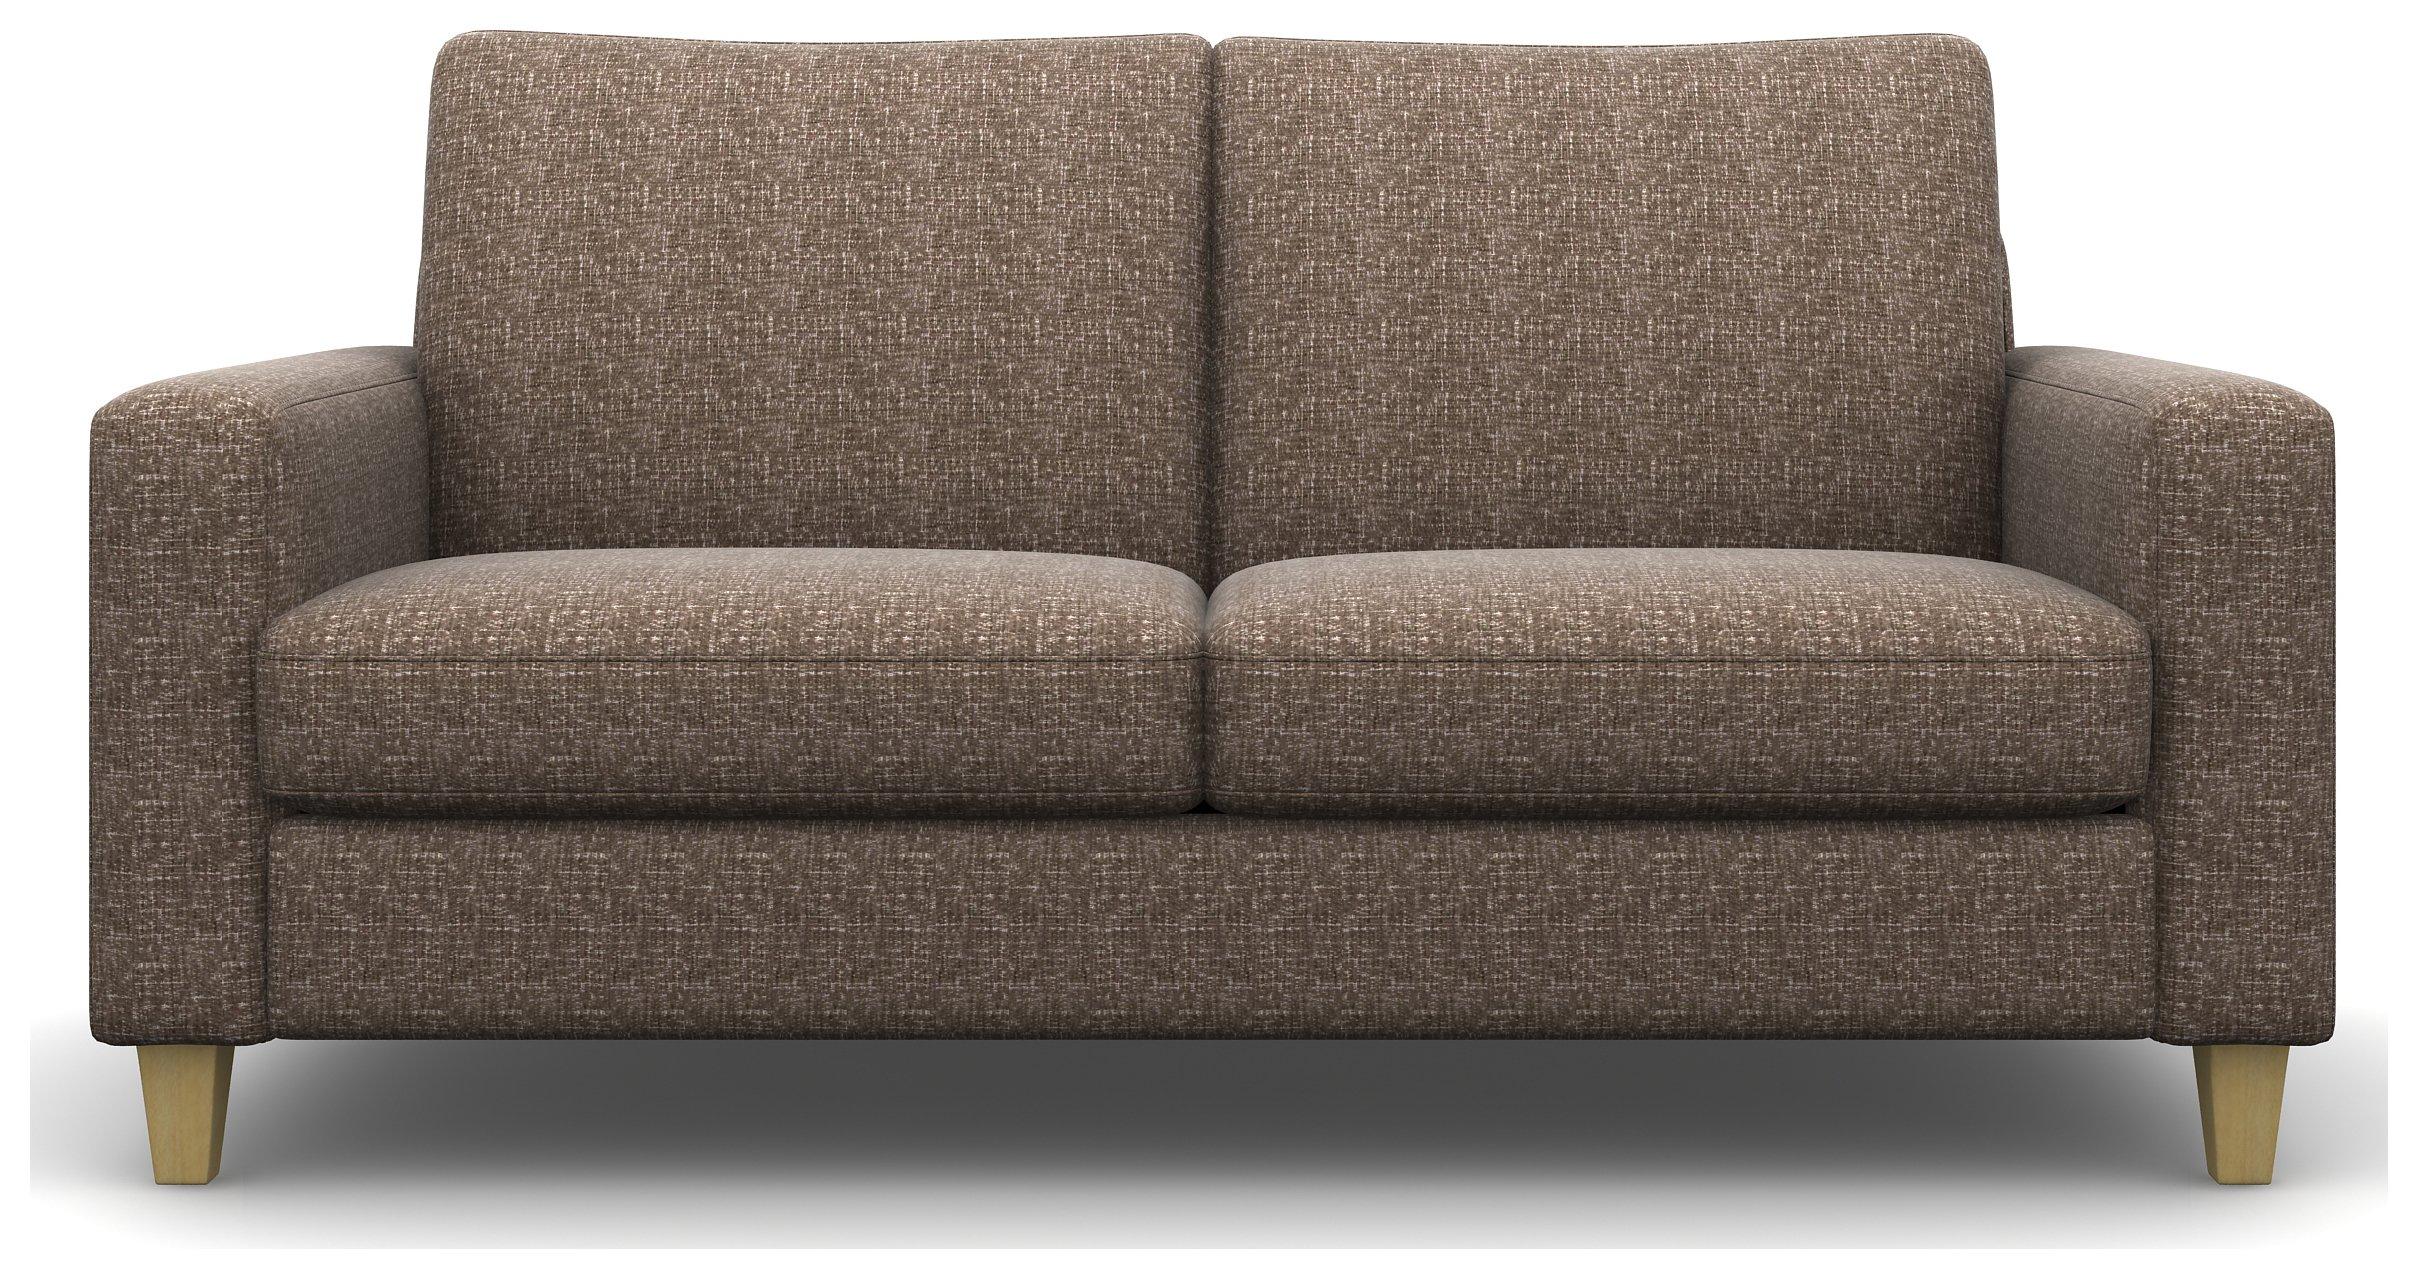 Heart of House Harrison 3 Seater Fabric Sofa - Mink.